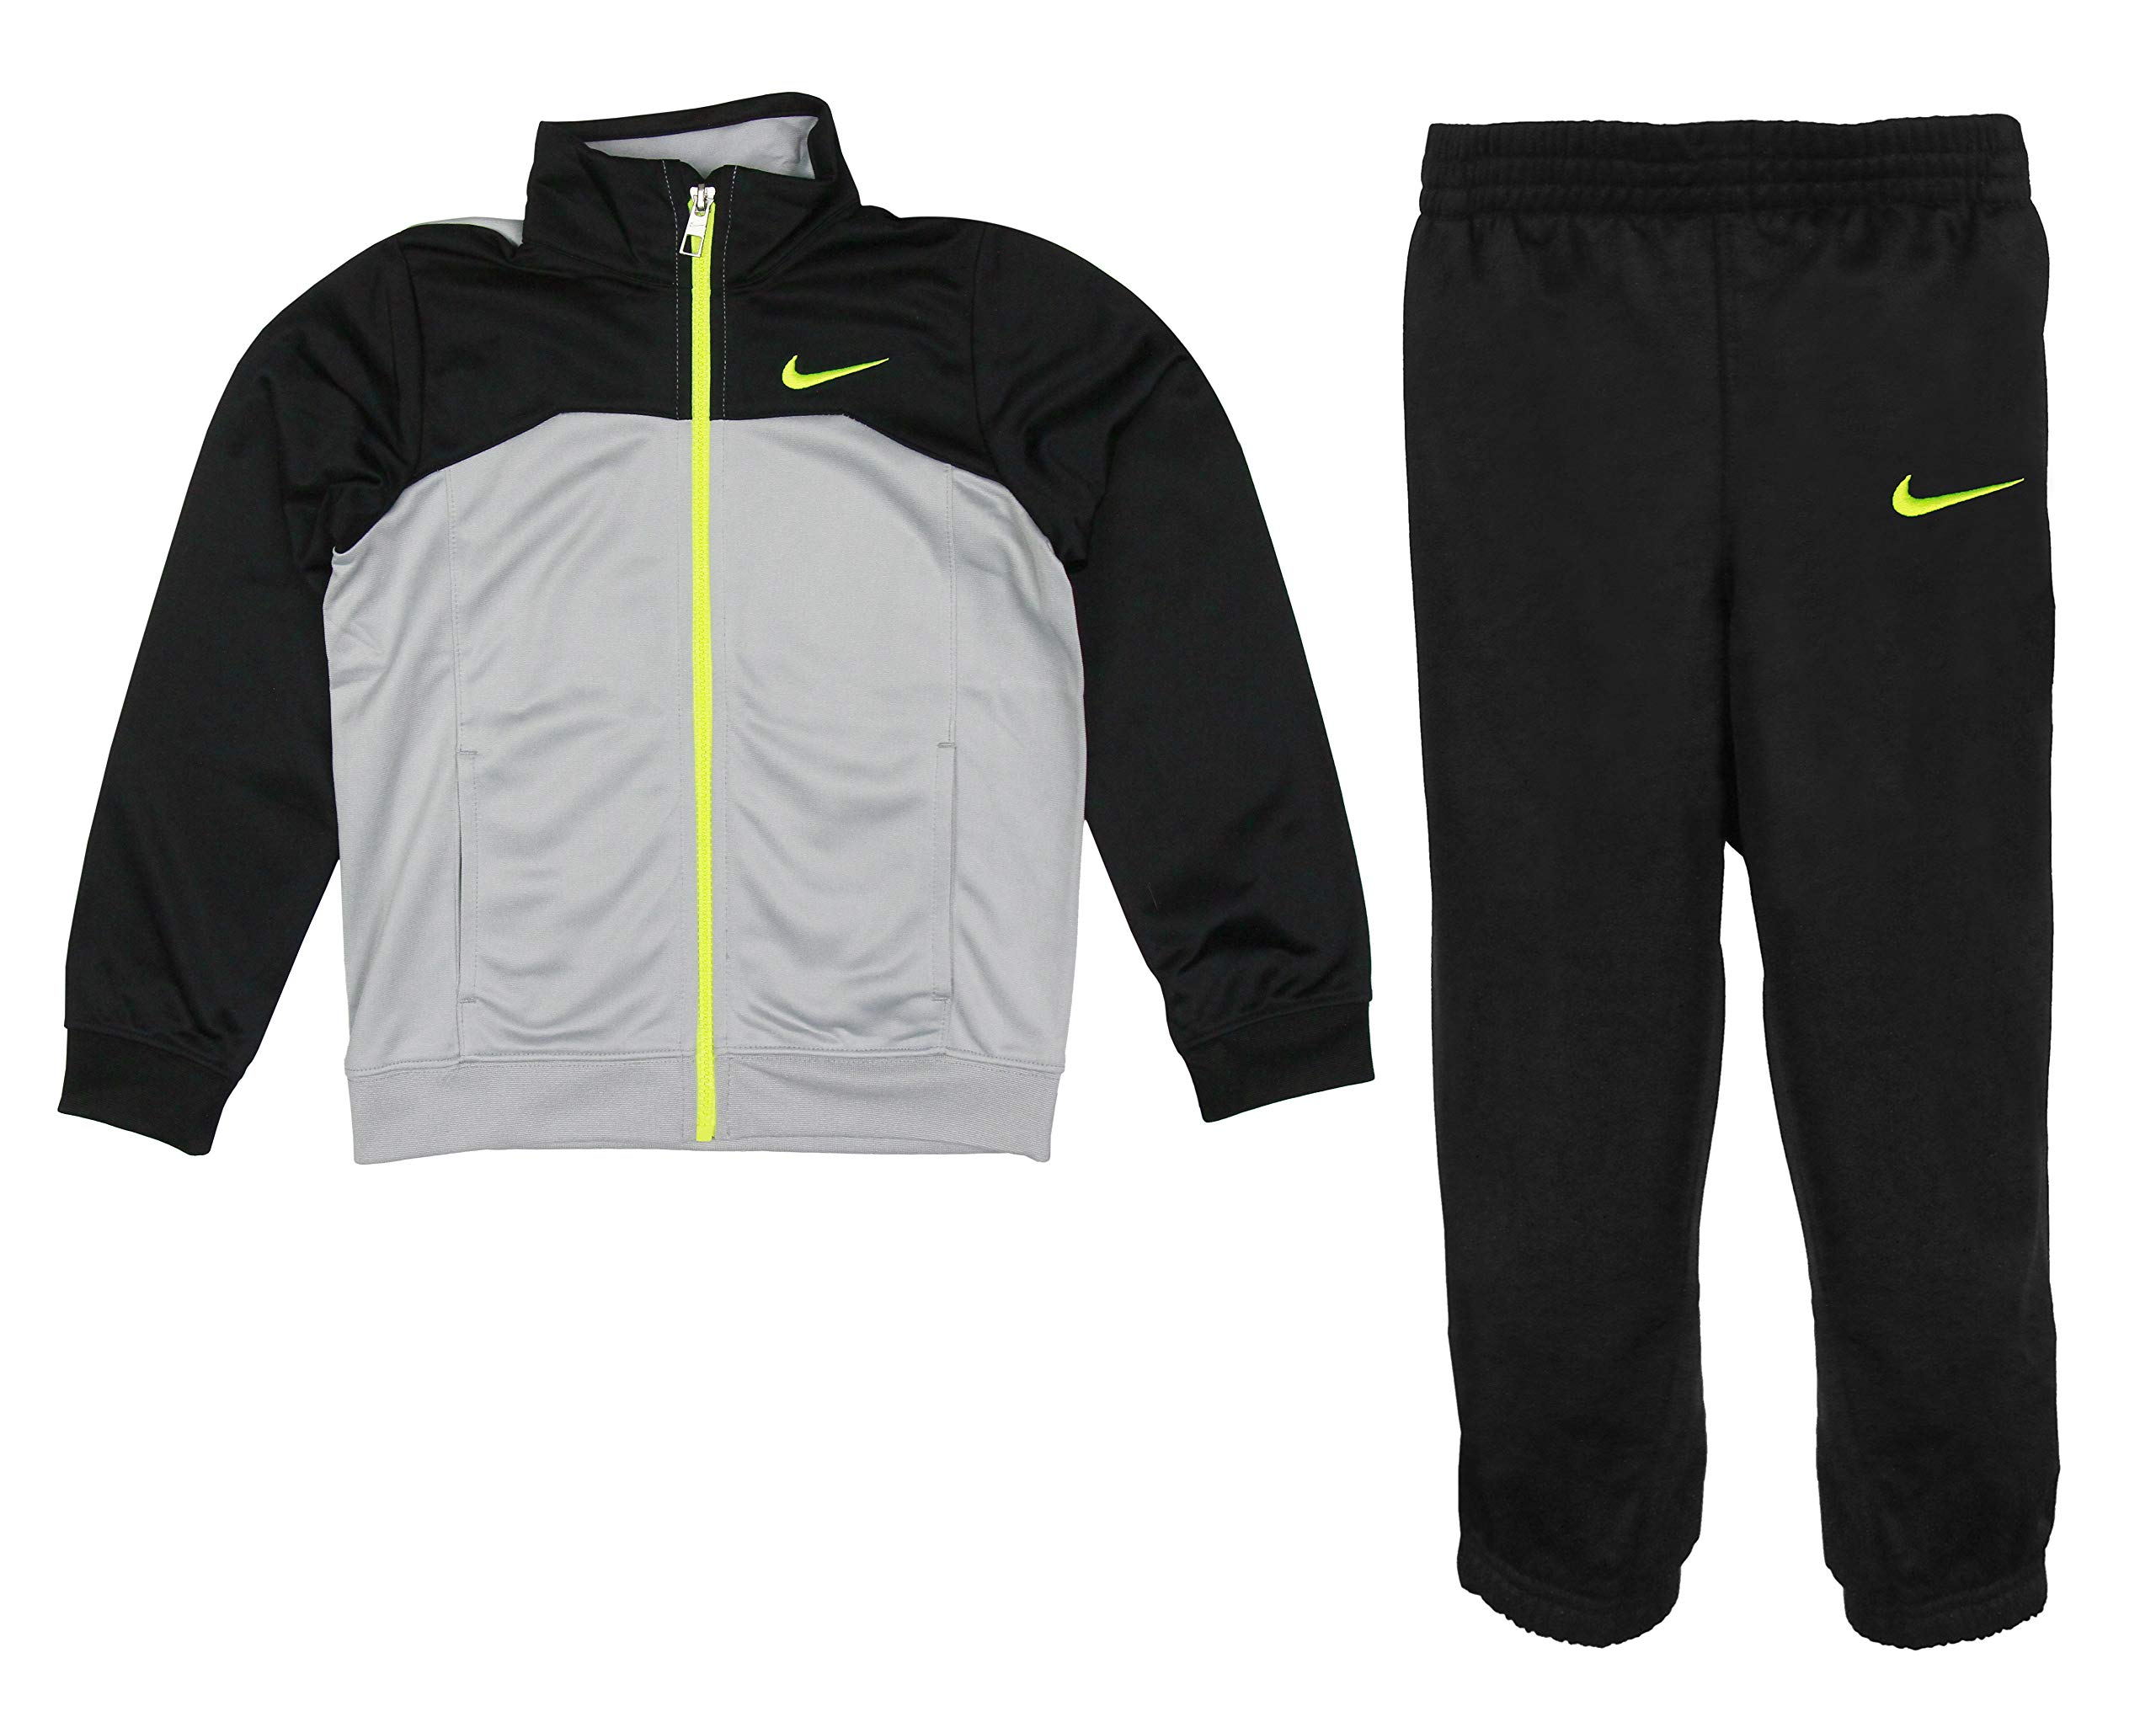 Nike Boys Two Piece Tracksuit Jacket & Pants Set - Black, Grey (6)